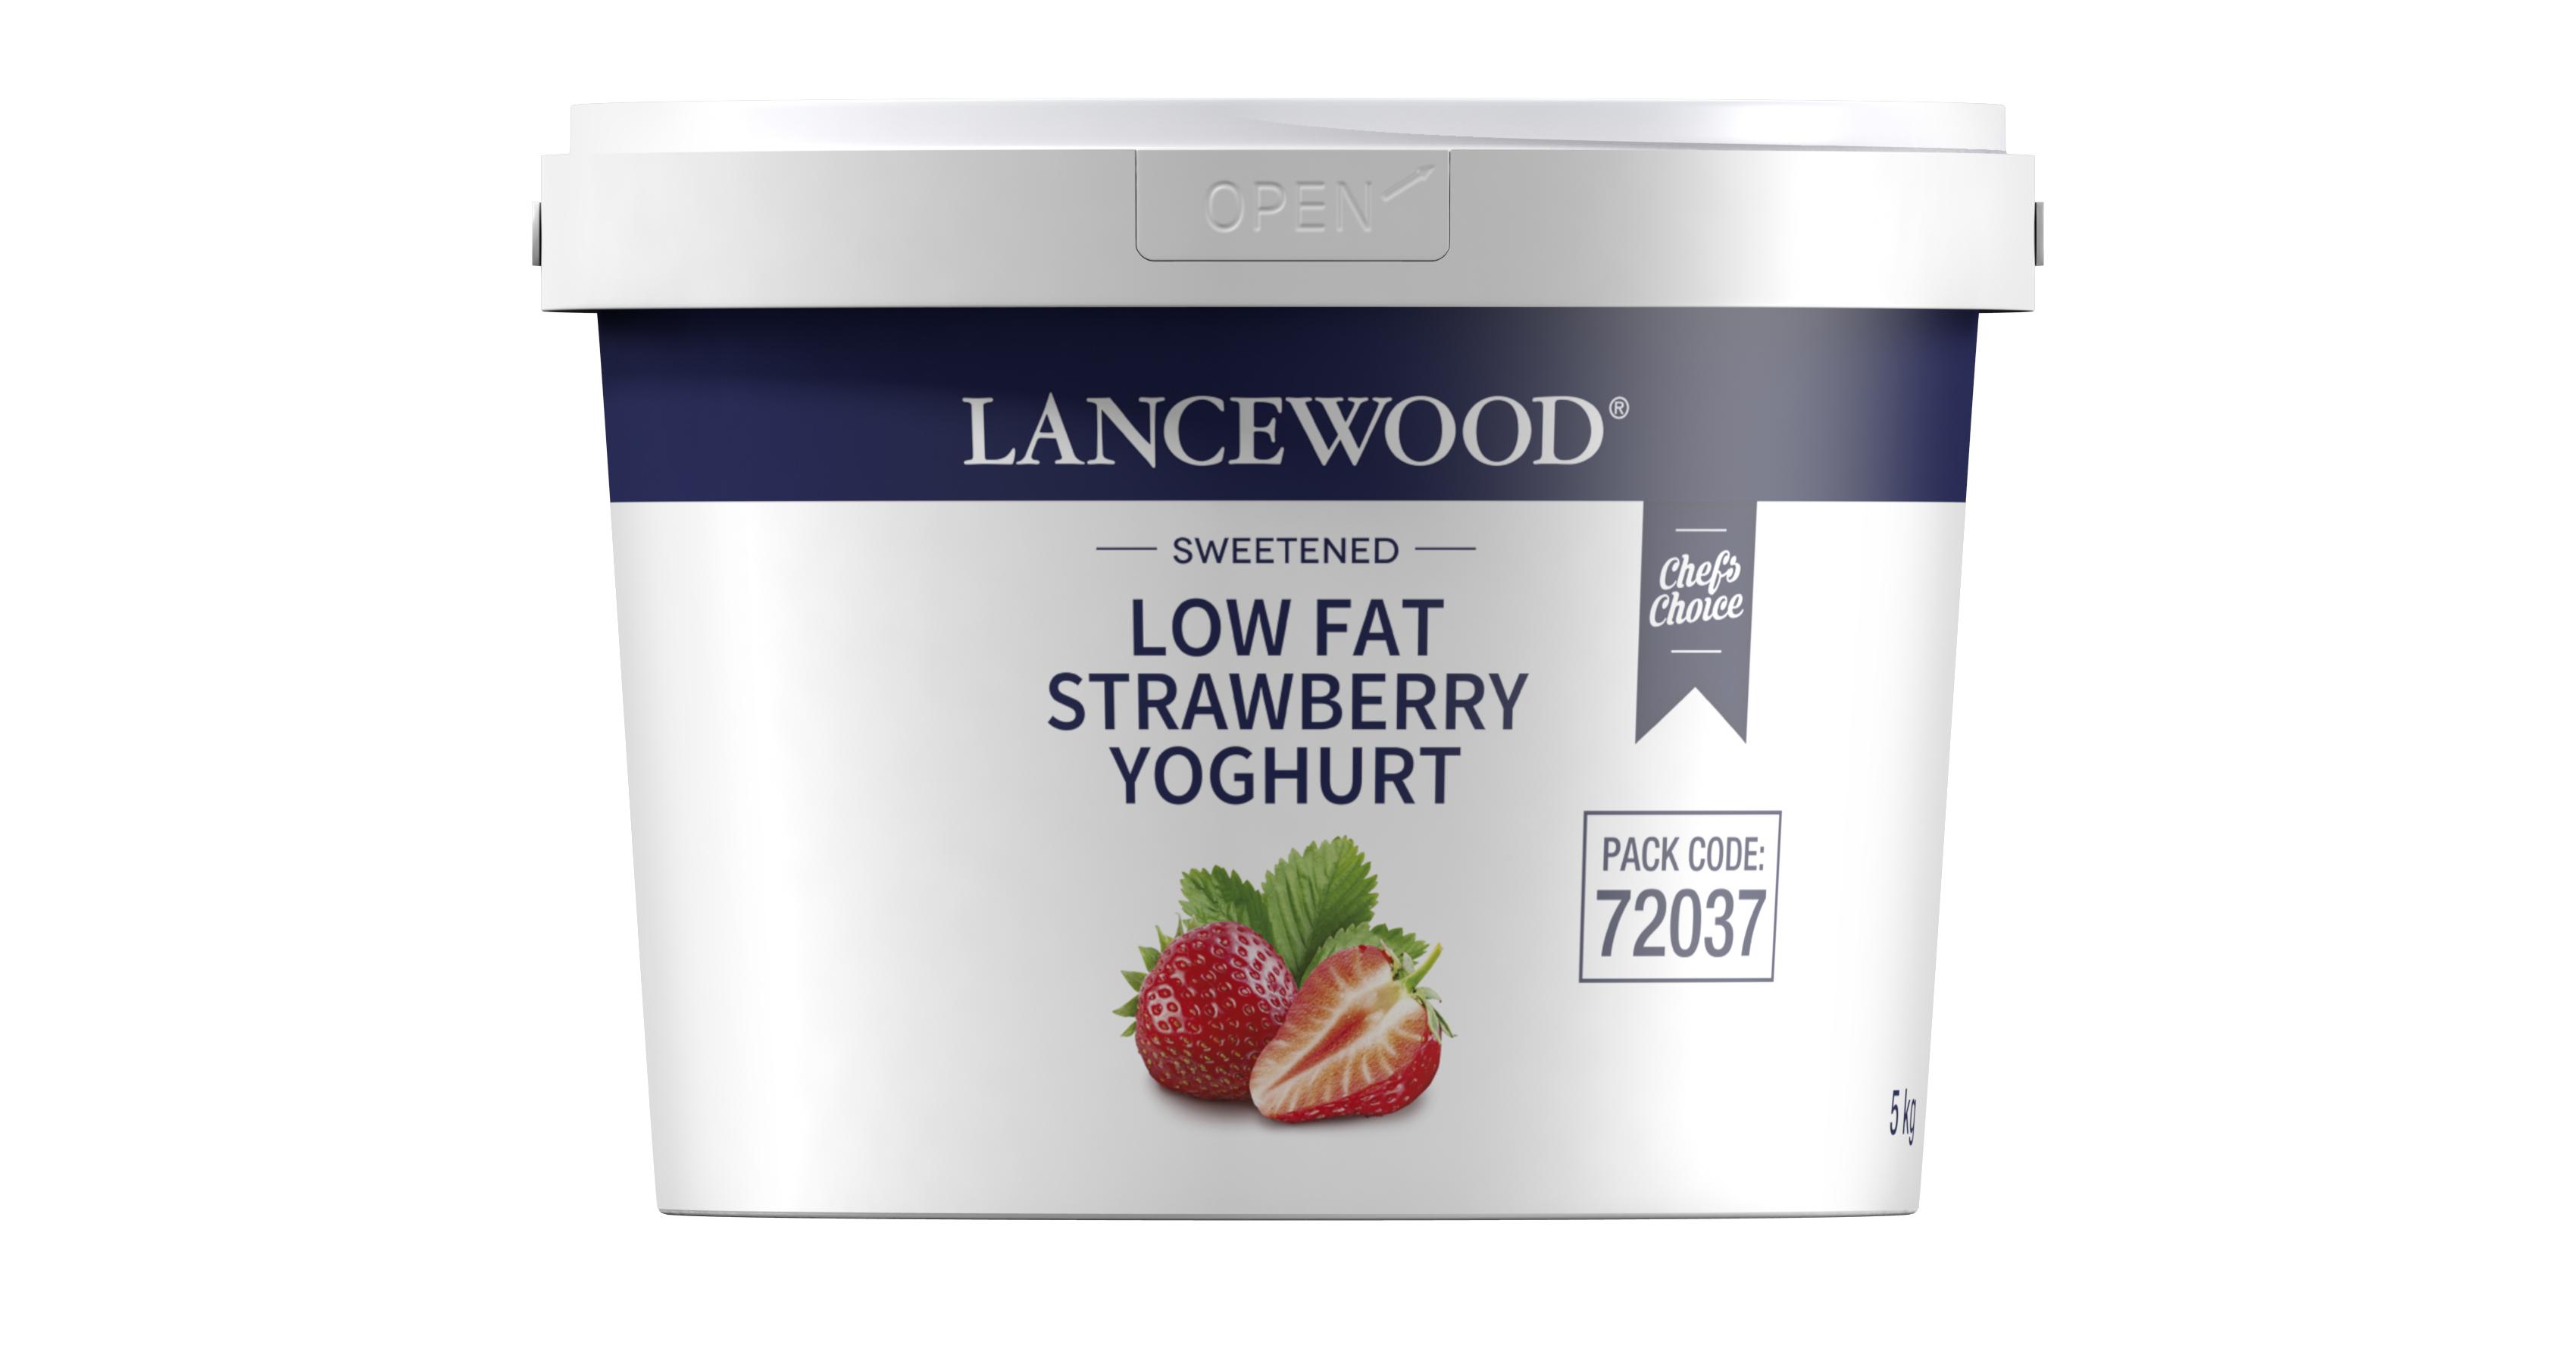 Low Fat Strawberry Yoghurt